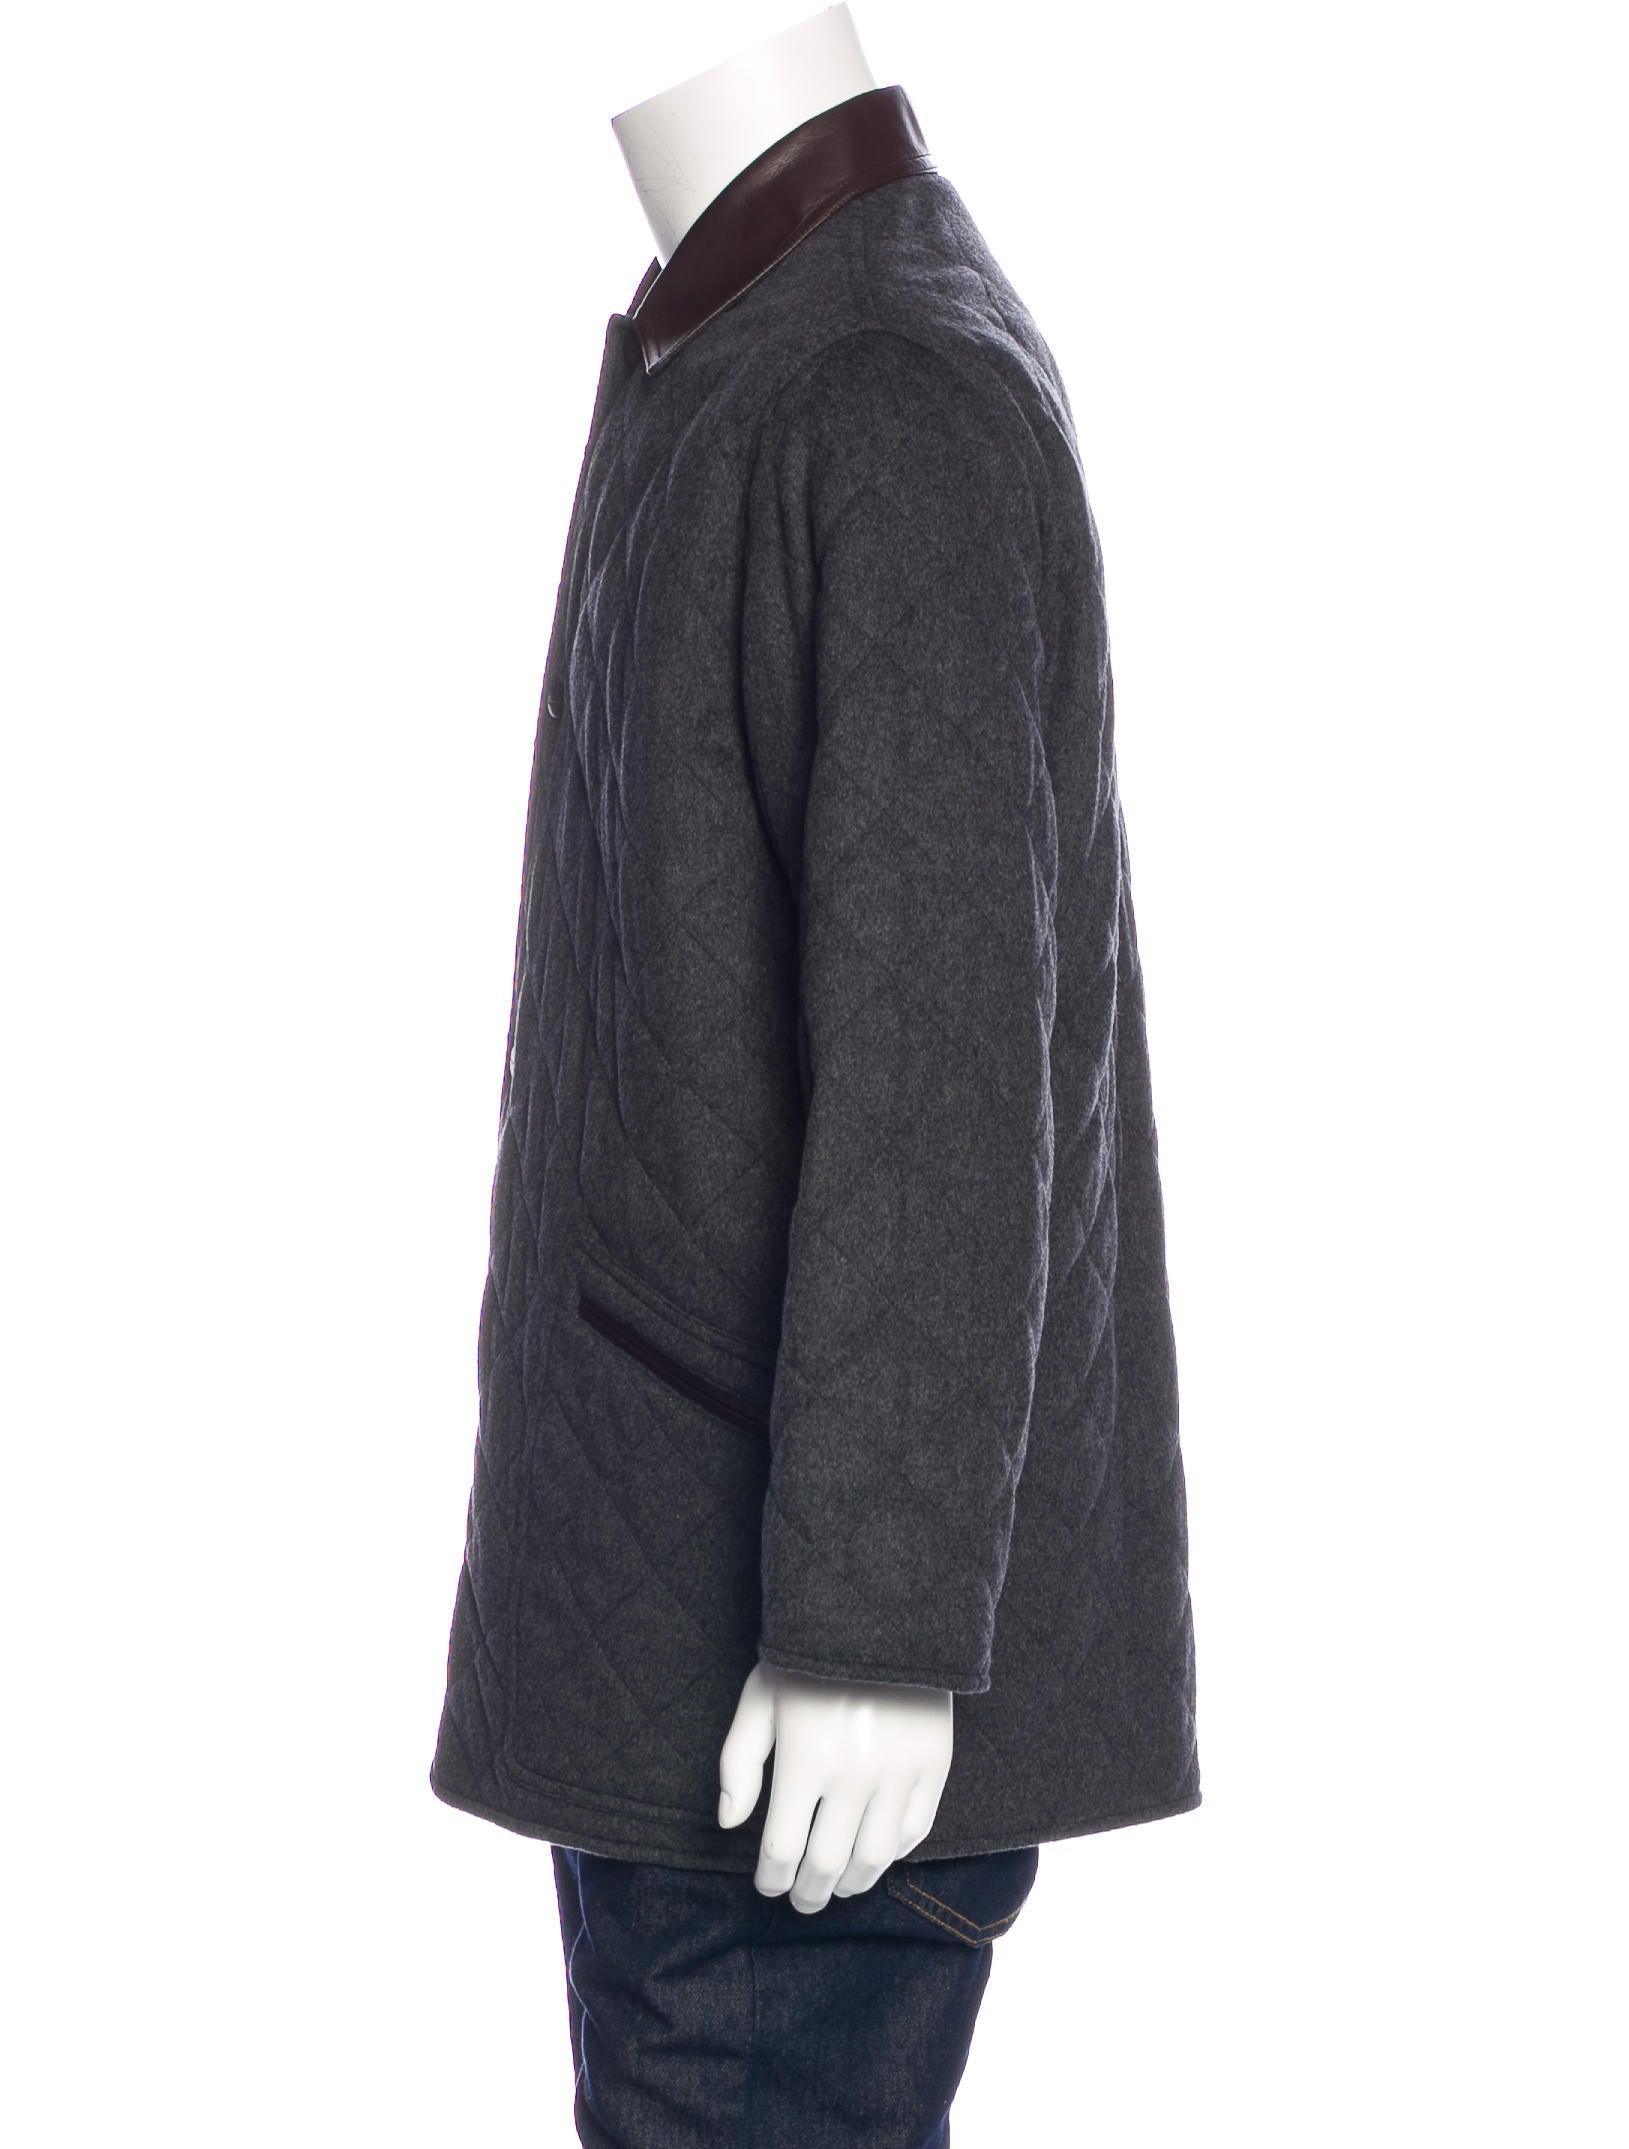 Salvatore Ferragamo Quilted Wool Coat Clothing